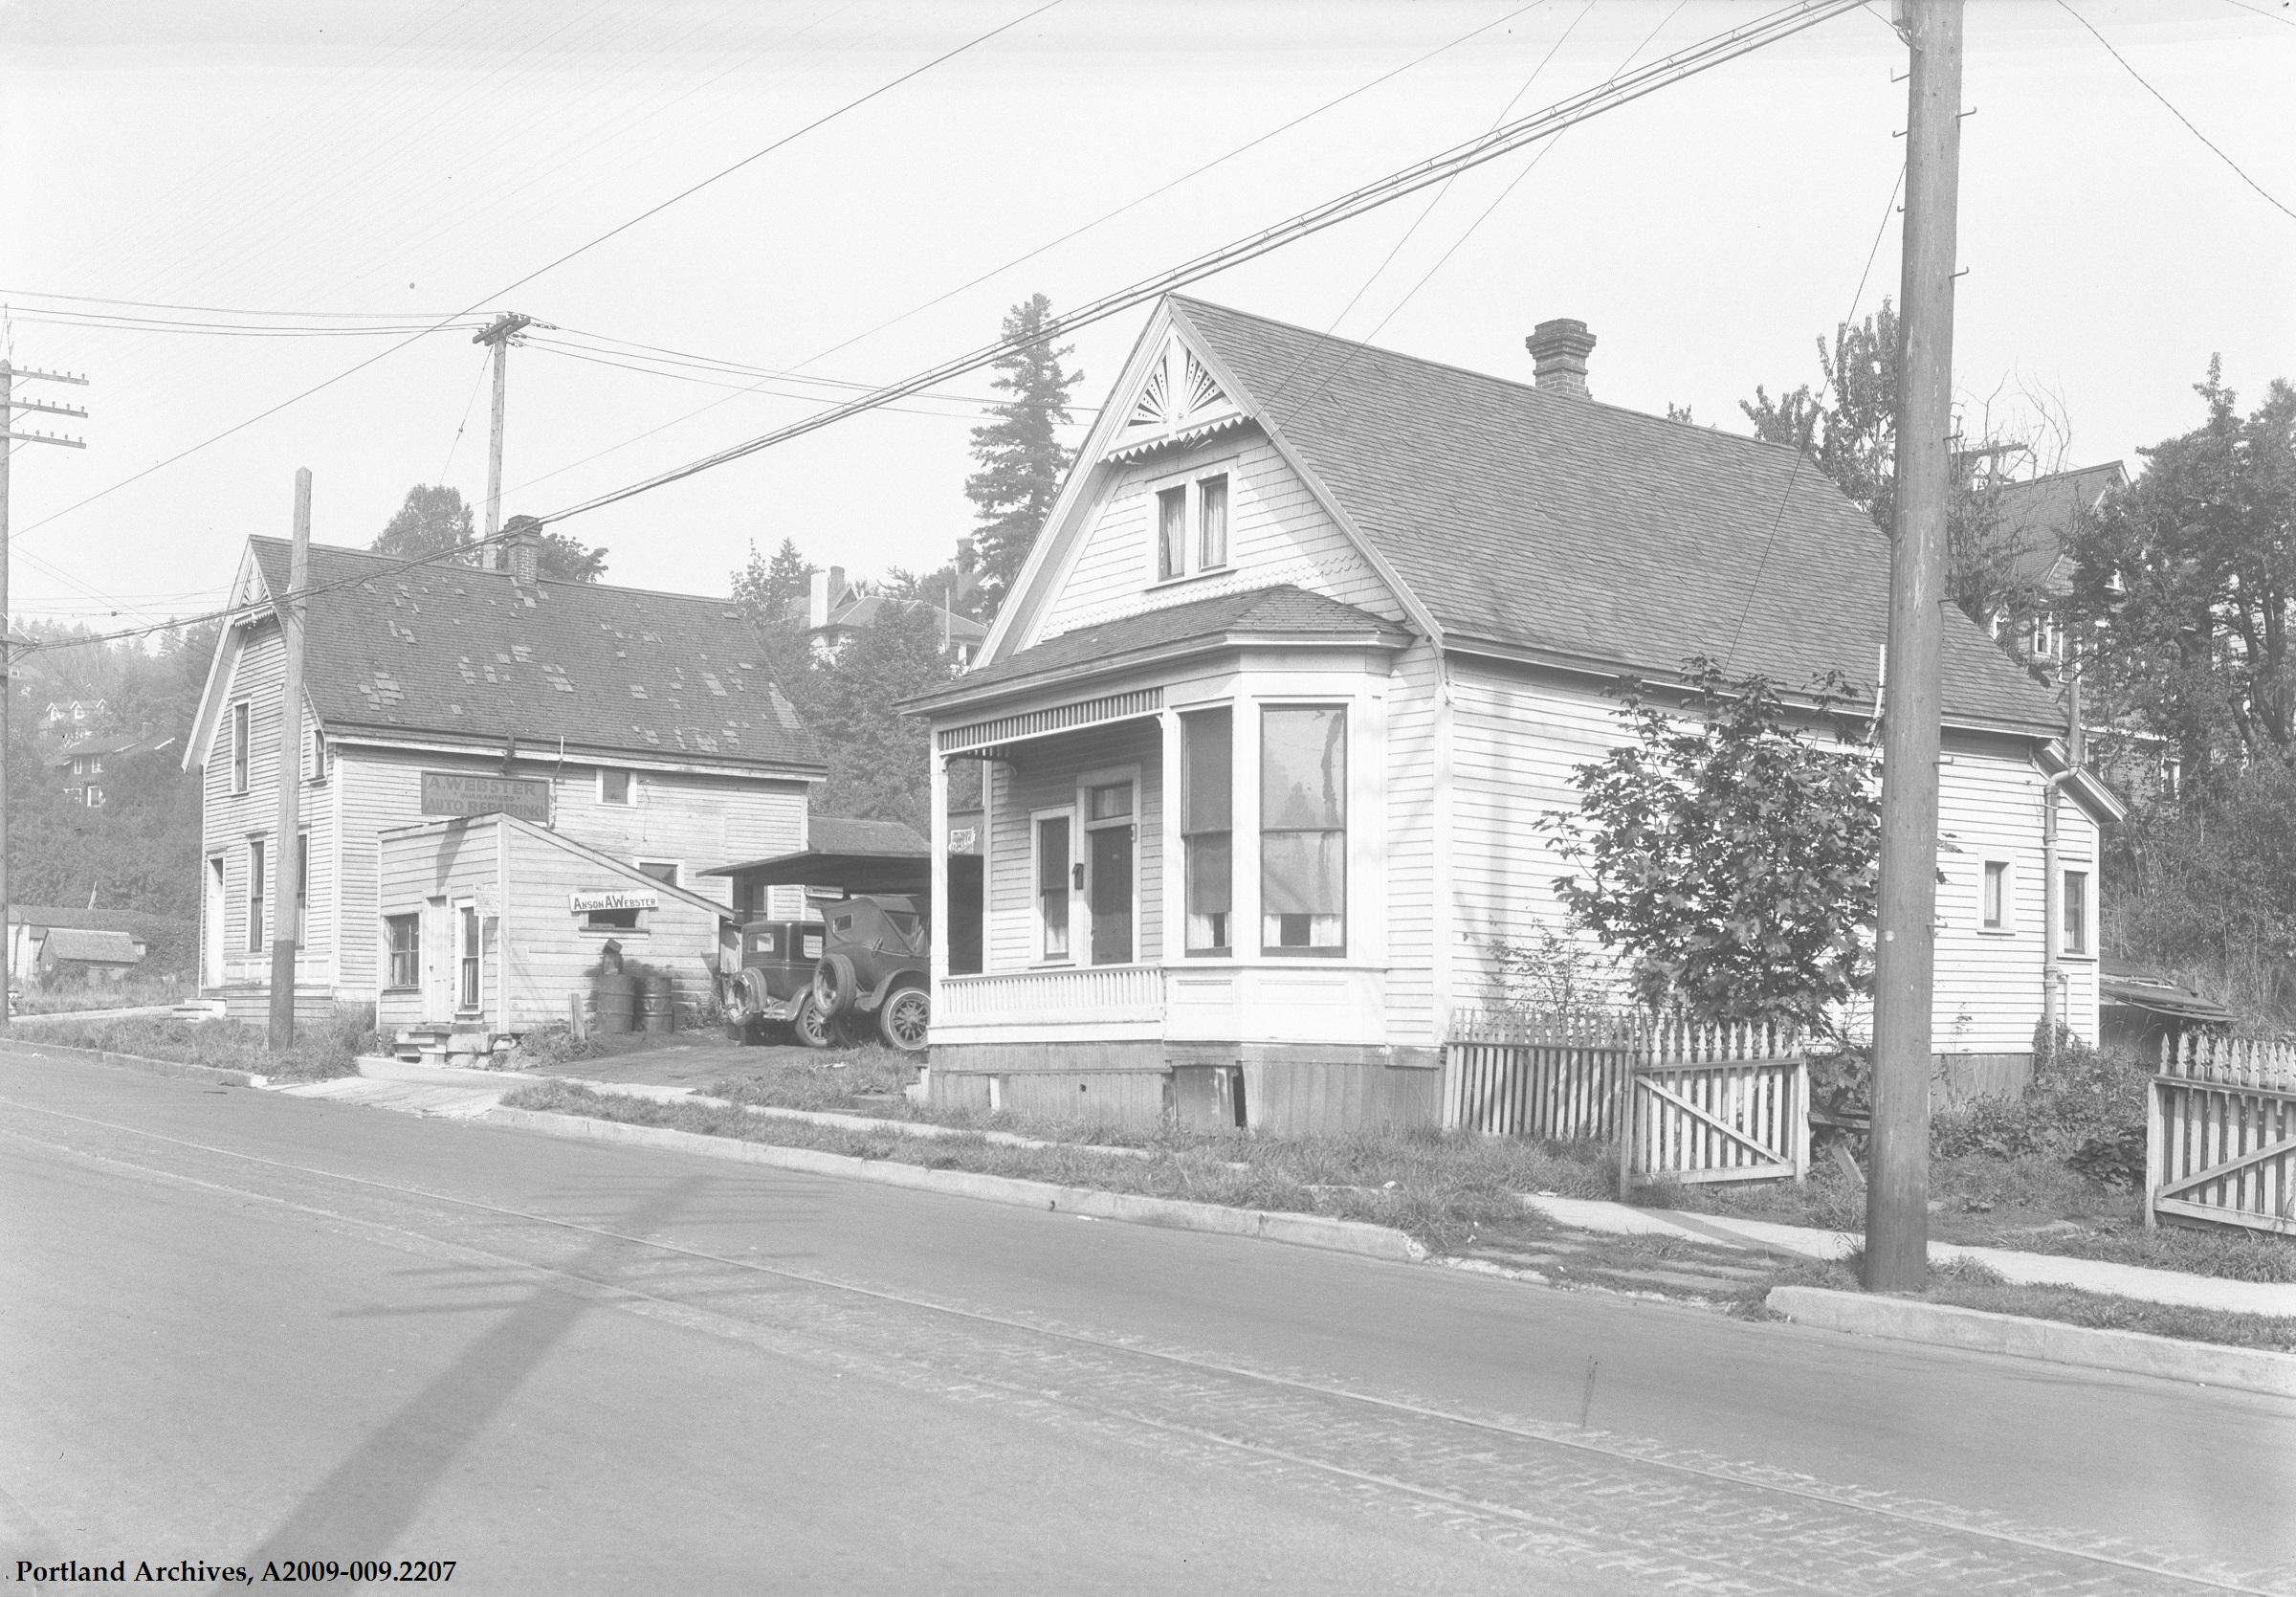 City of Portland Archives, Oregon, A2009-009.2207